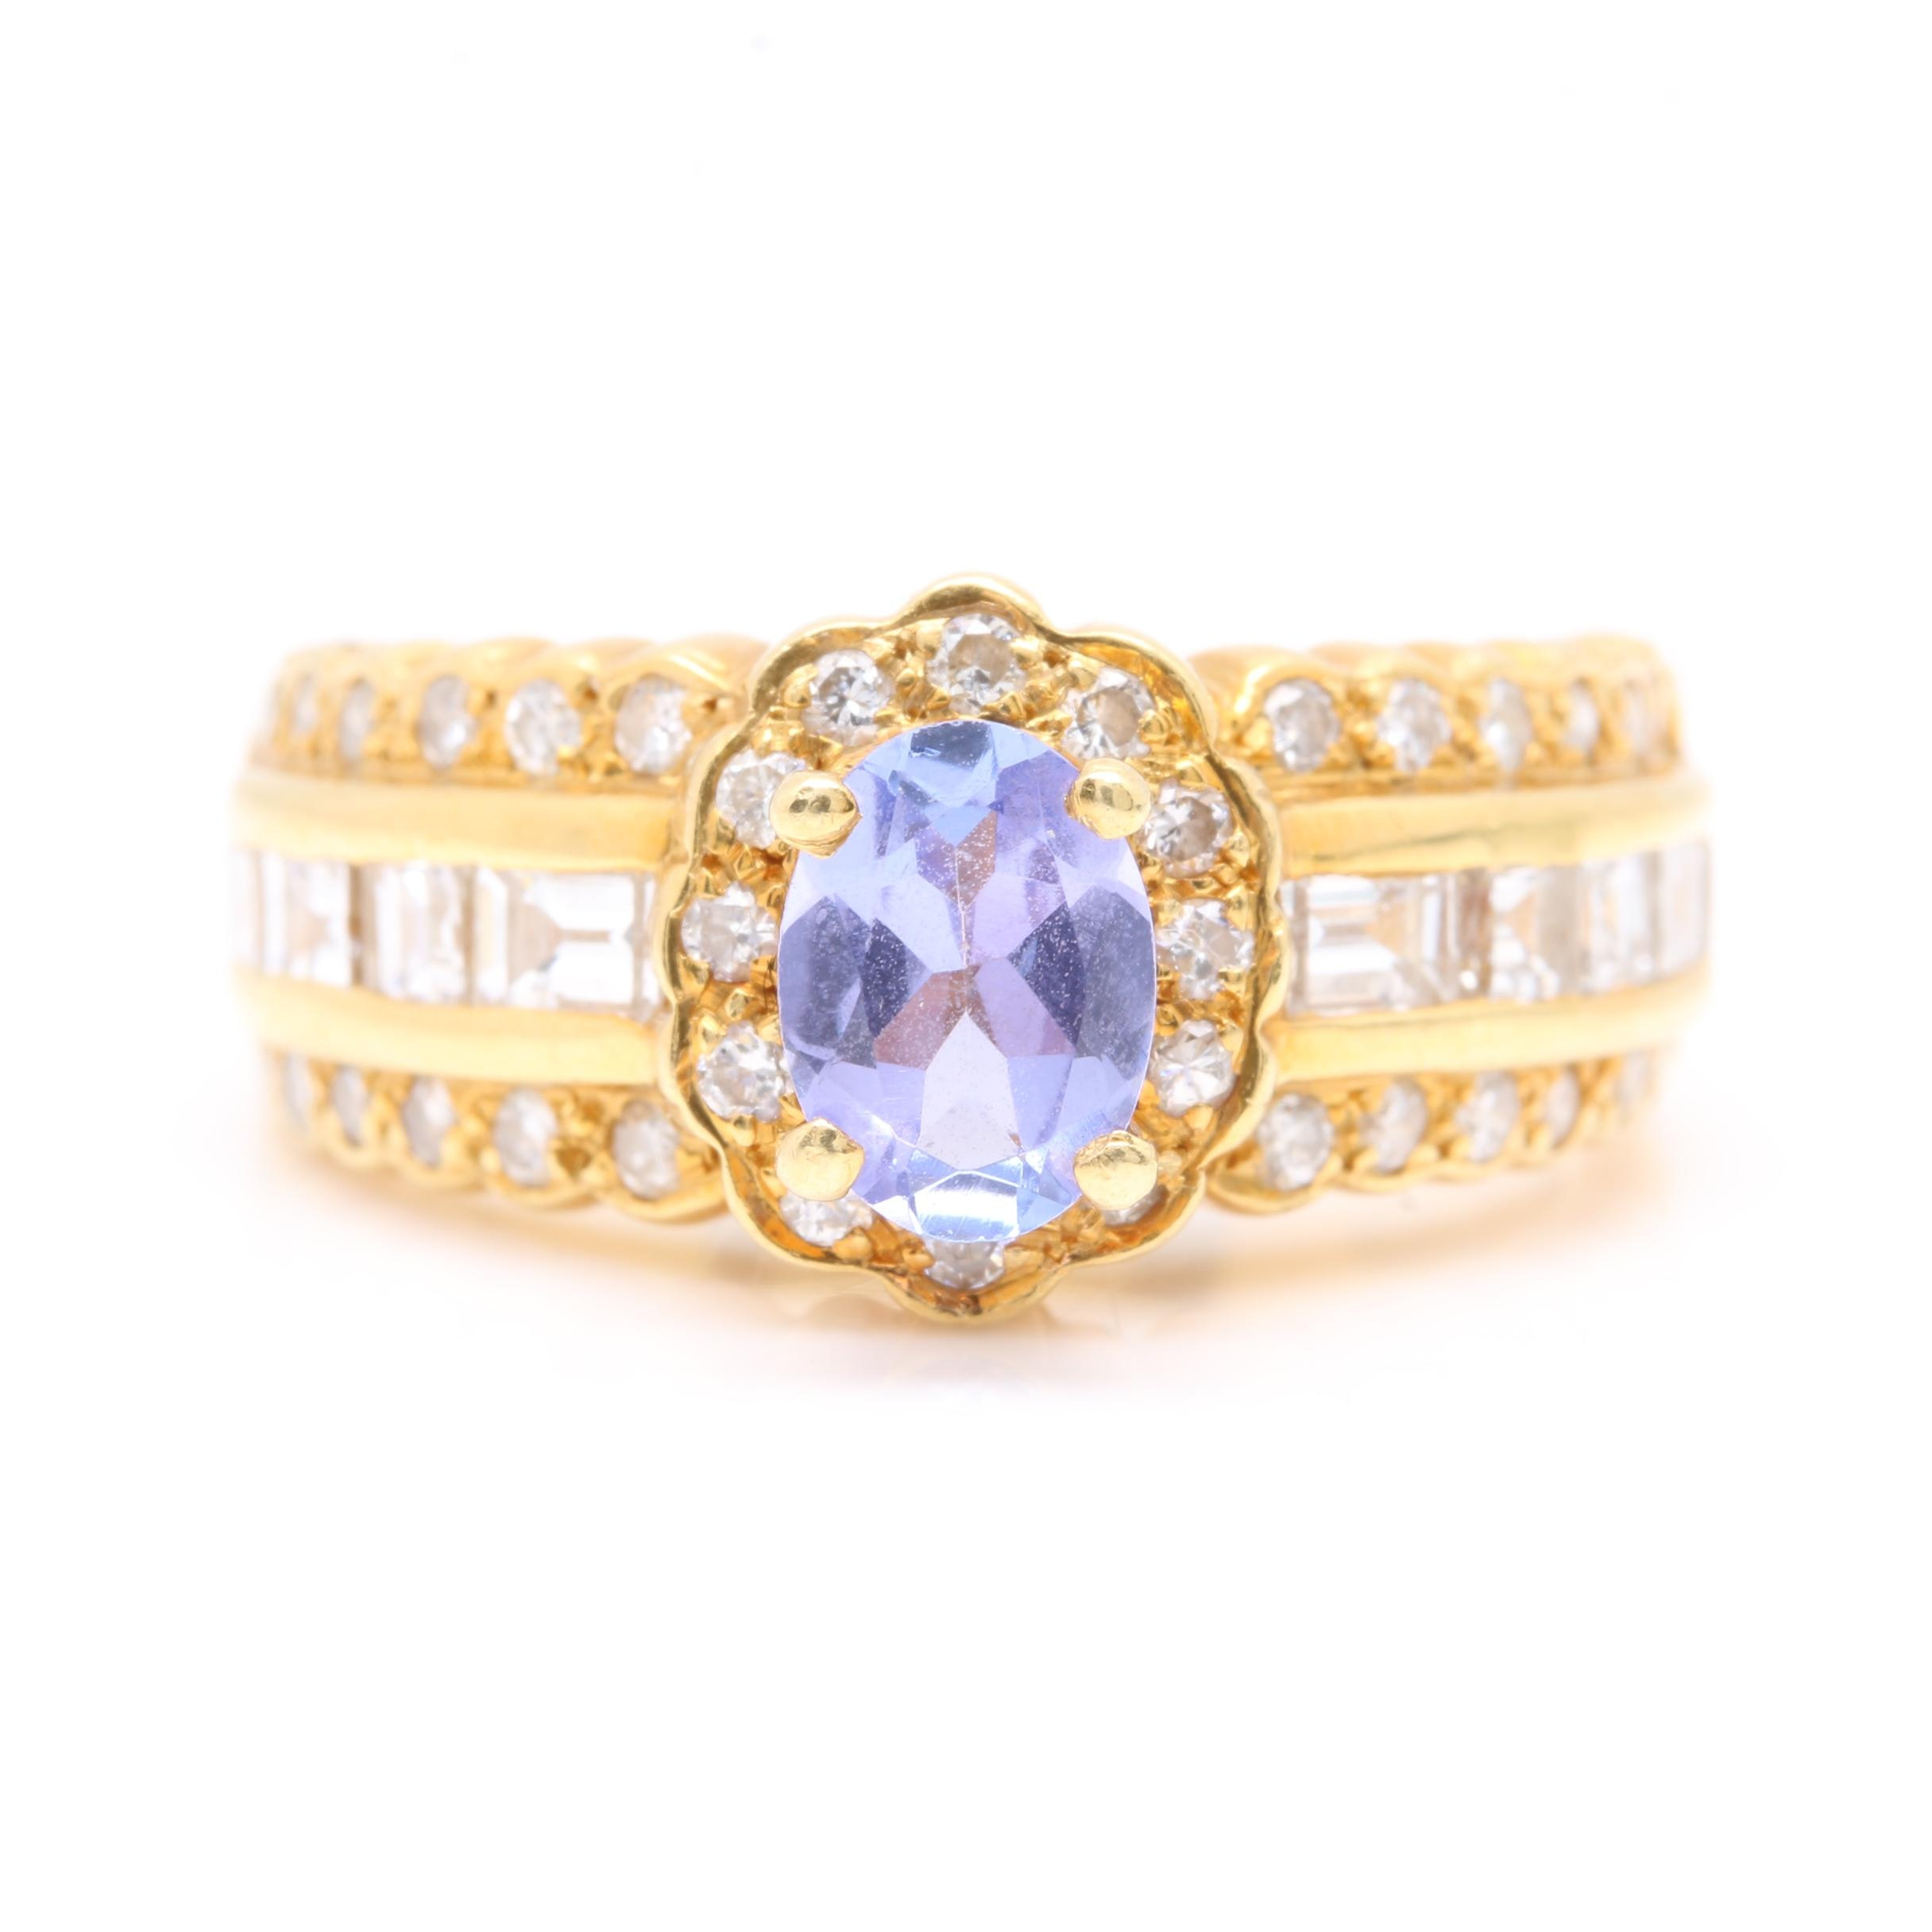 18K Yellow Gold Tanzanite and 1.45 CTW Diamond Ring